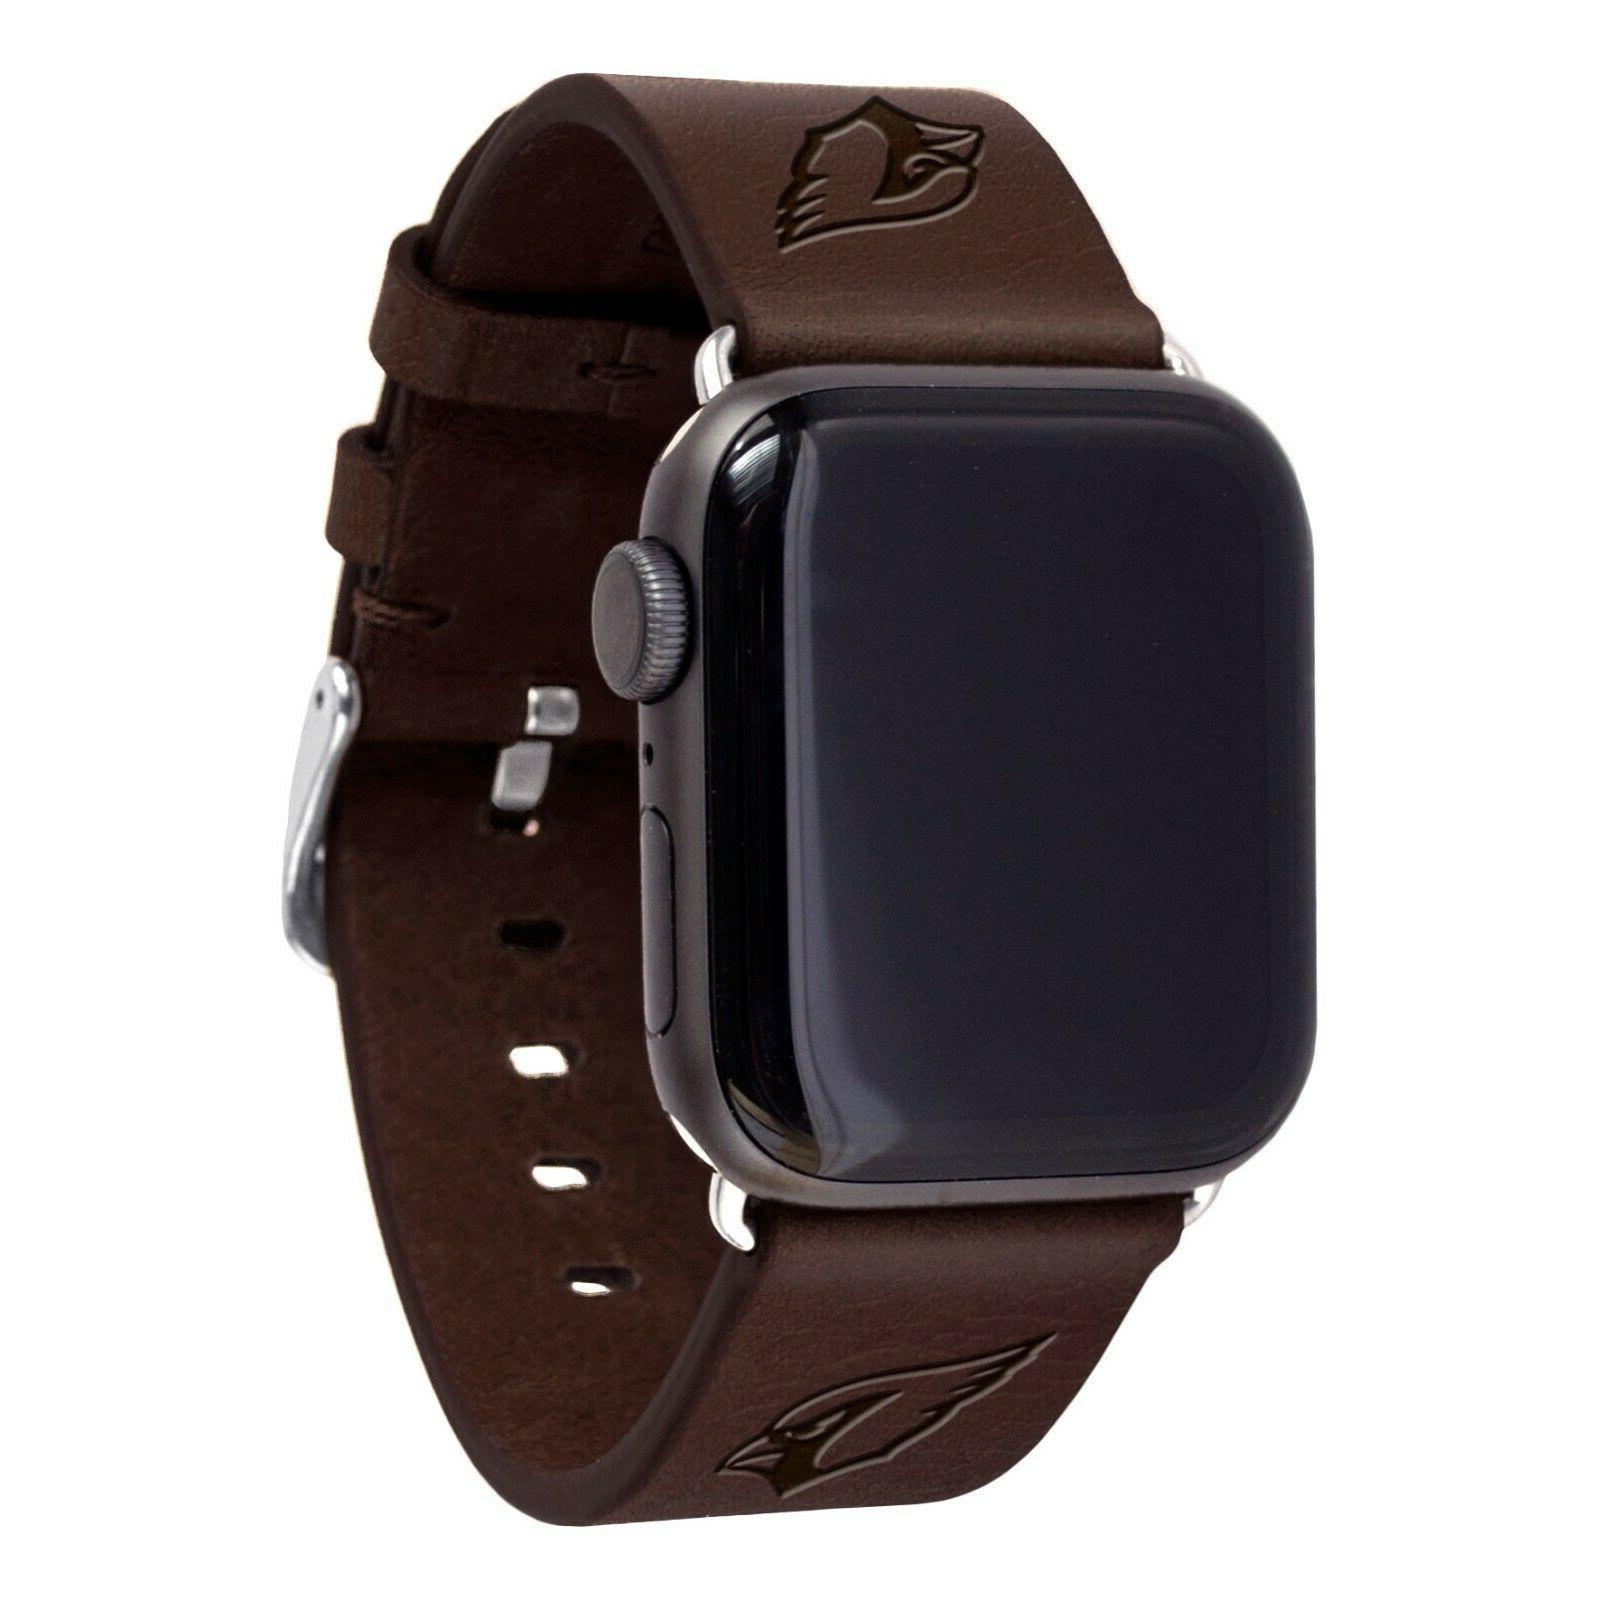 Arizona Apple Watch